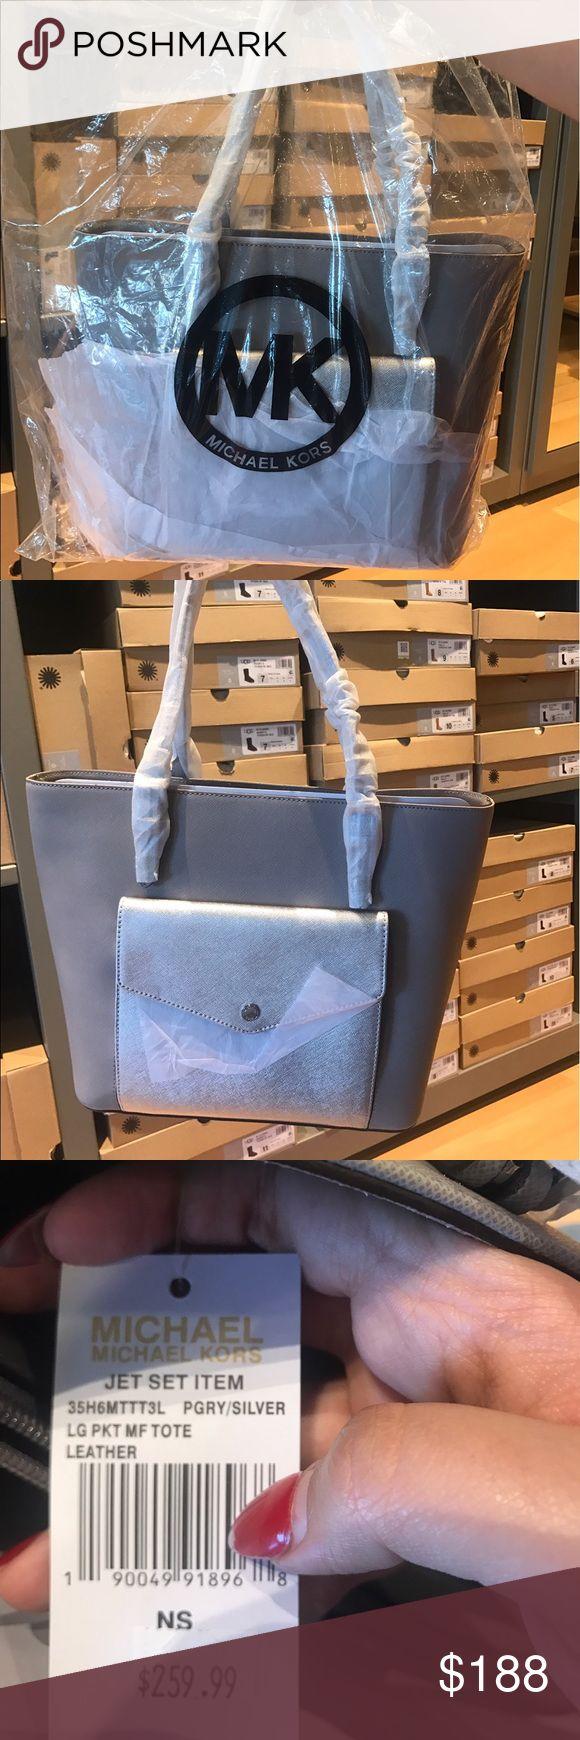 Michael kors grey and silver handbag Michael kors tote brand new with tags in original packaging Michael Kors Bags Totes